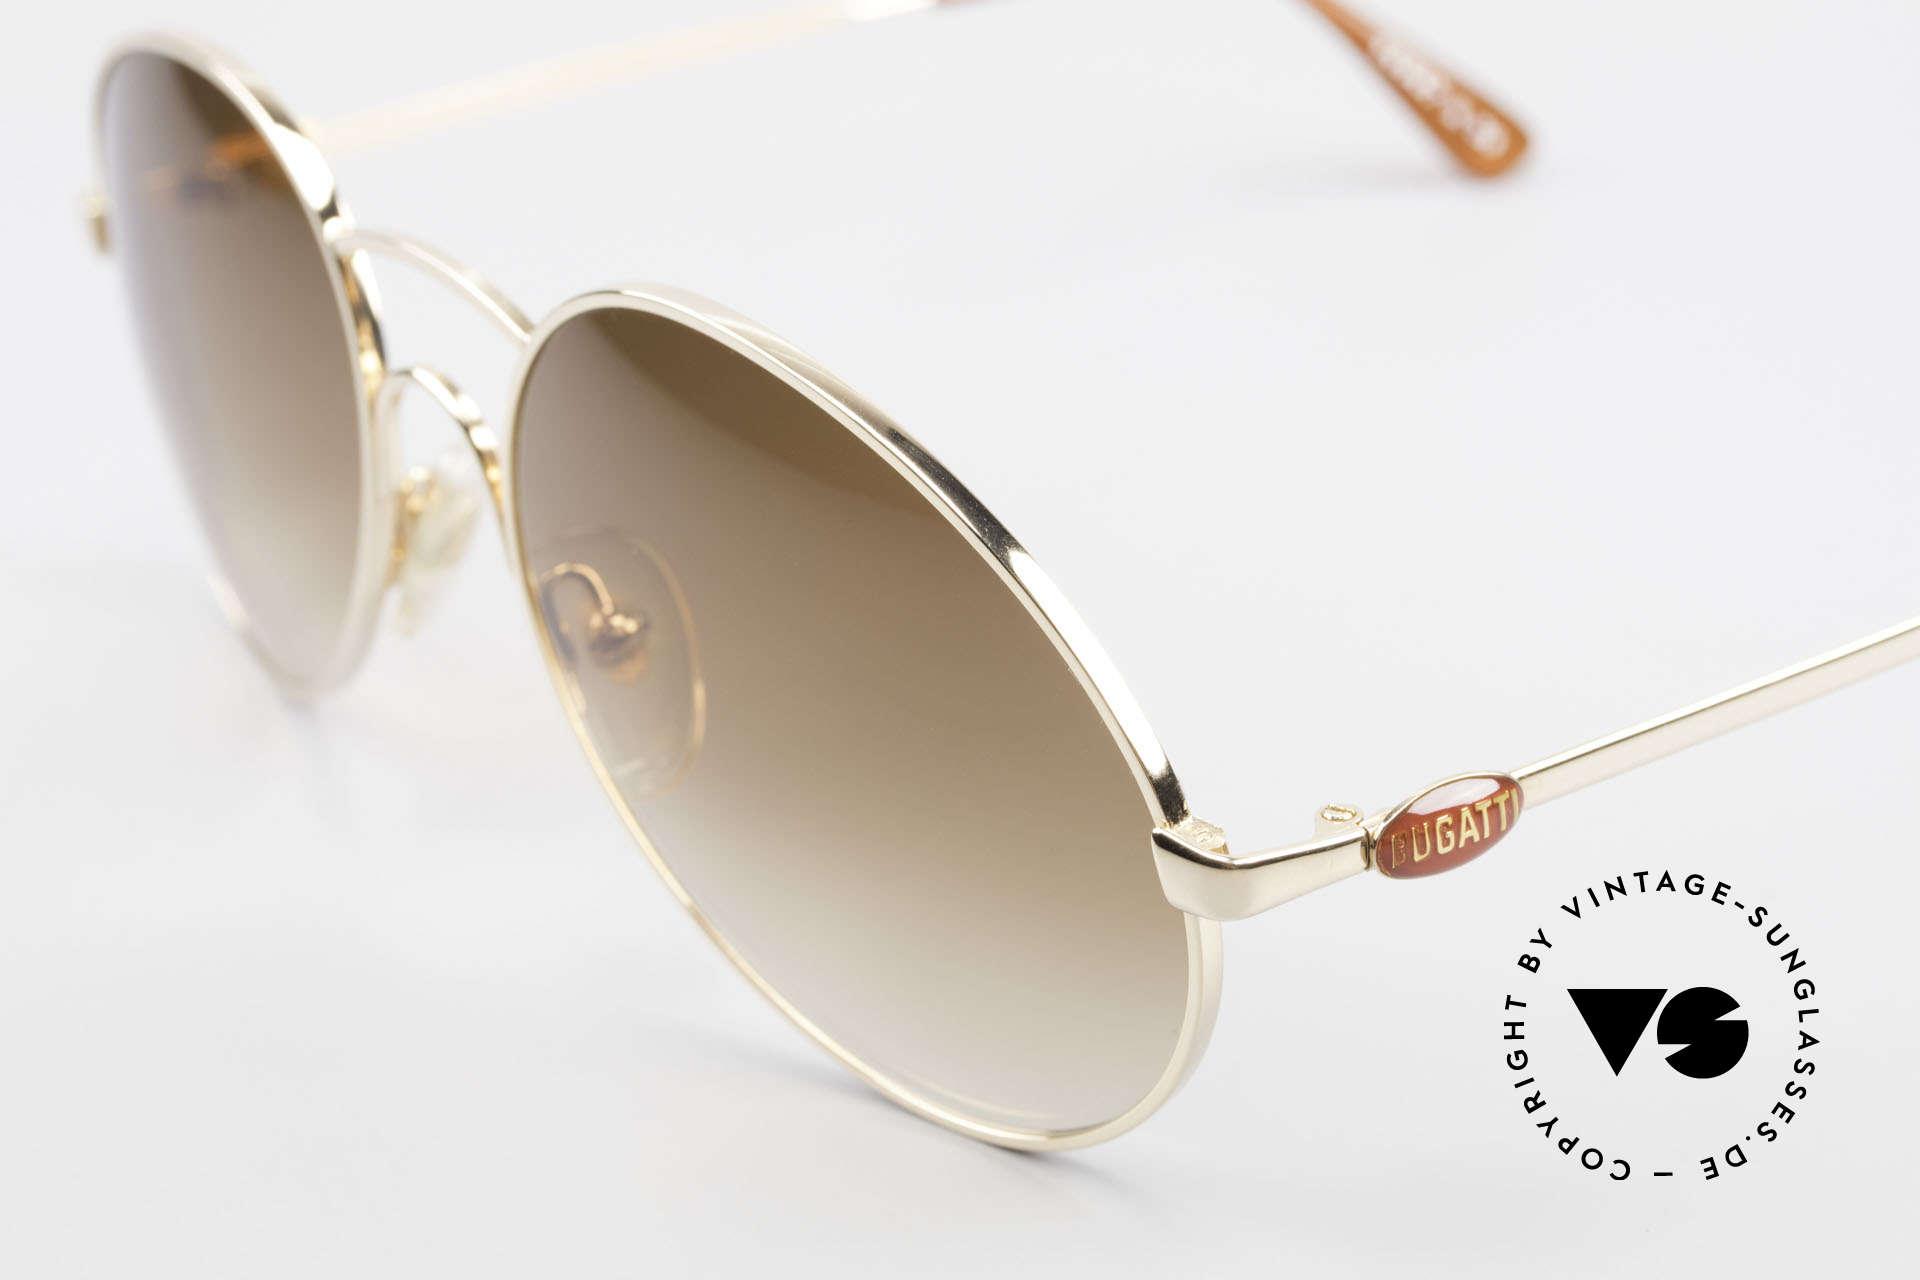 Bugatti 64947 Original 1980's XL Sunglasses, luxury sunglasses for men in X-LARGE size (146mm), Made for Men